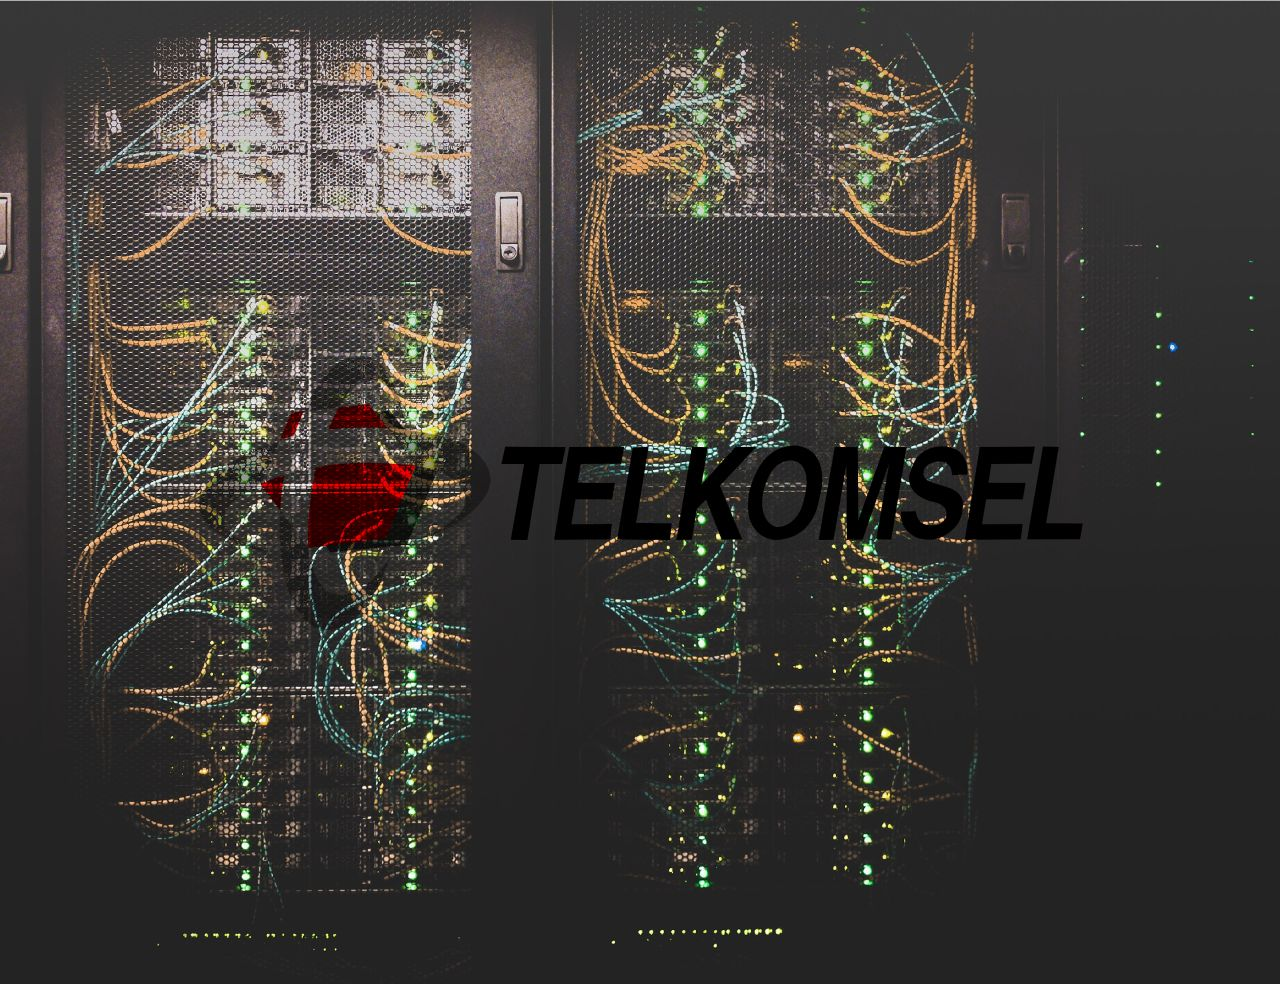 aplikasi-penguat-sinyal-telkomsel